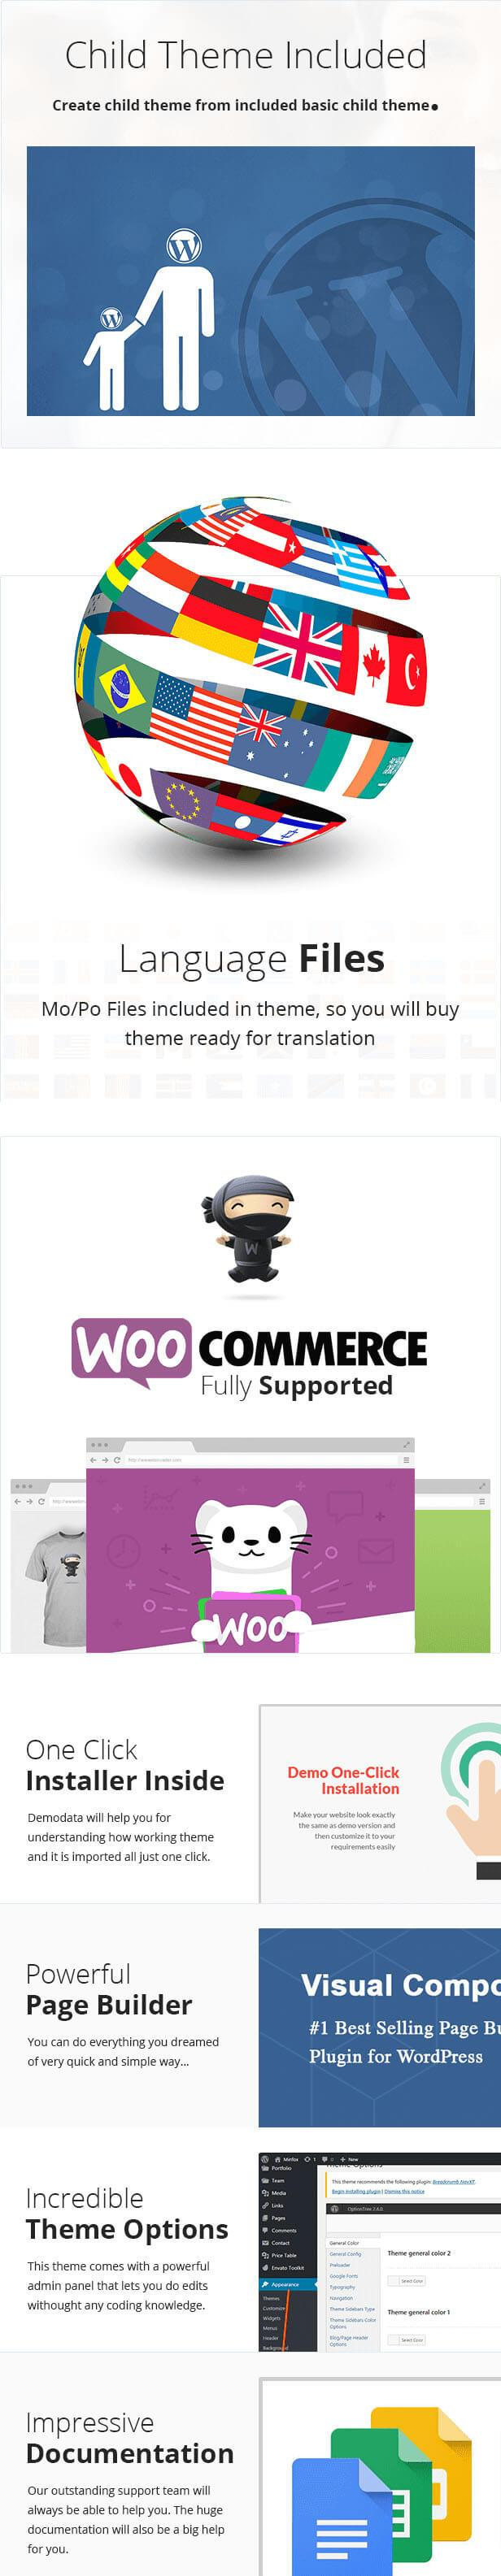 Nonprofit WordPress Theme - Ahope - 1